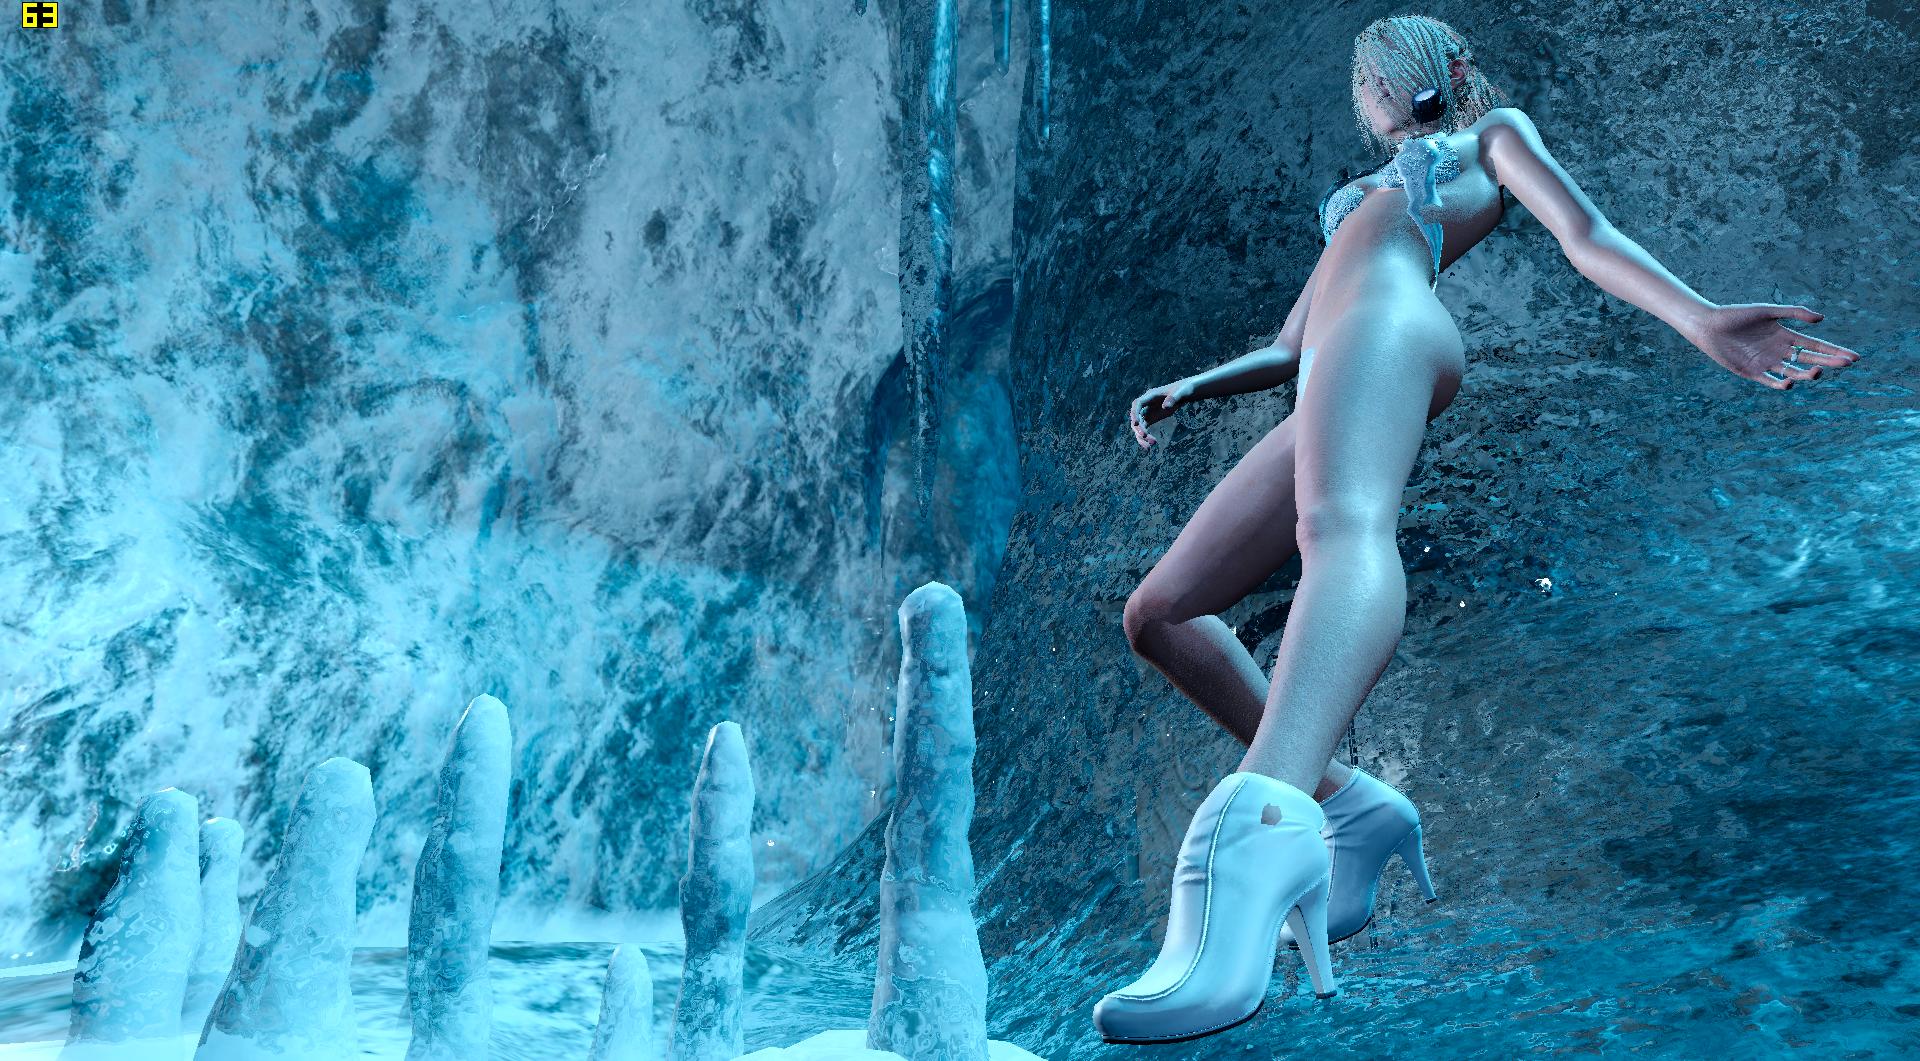 Final Fantasy XV Windows Edition Screenshot 2019.02.10 - 18.13.02.09.png